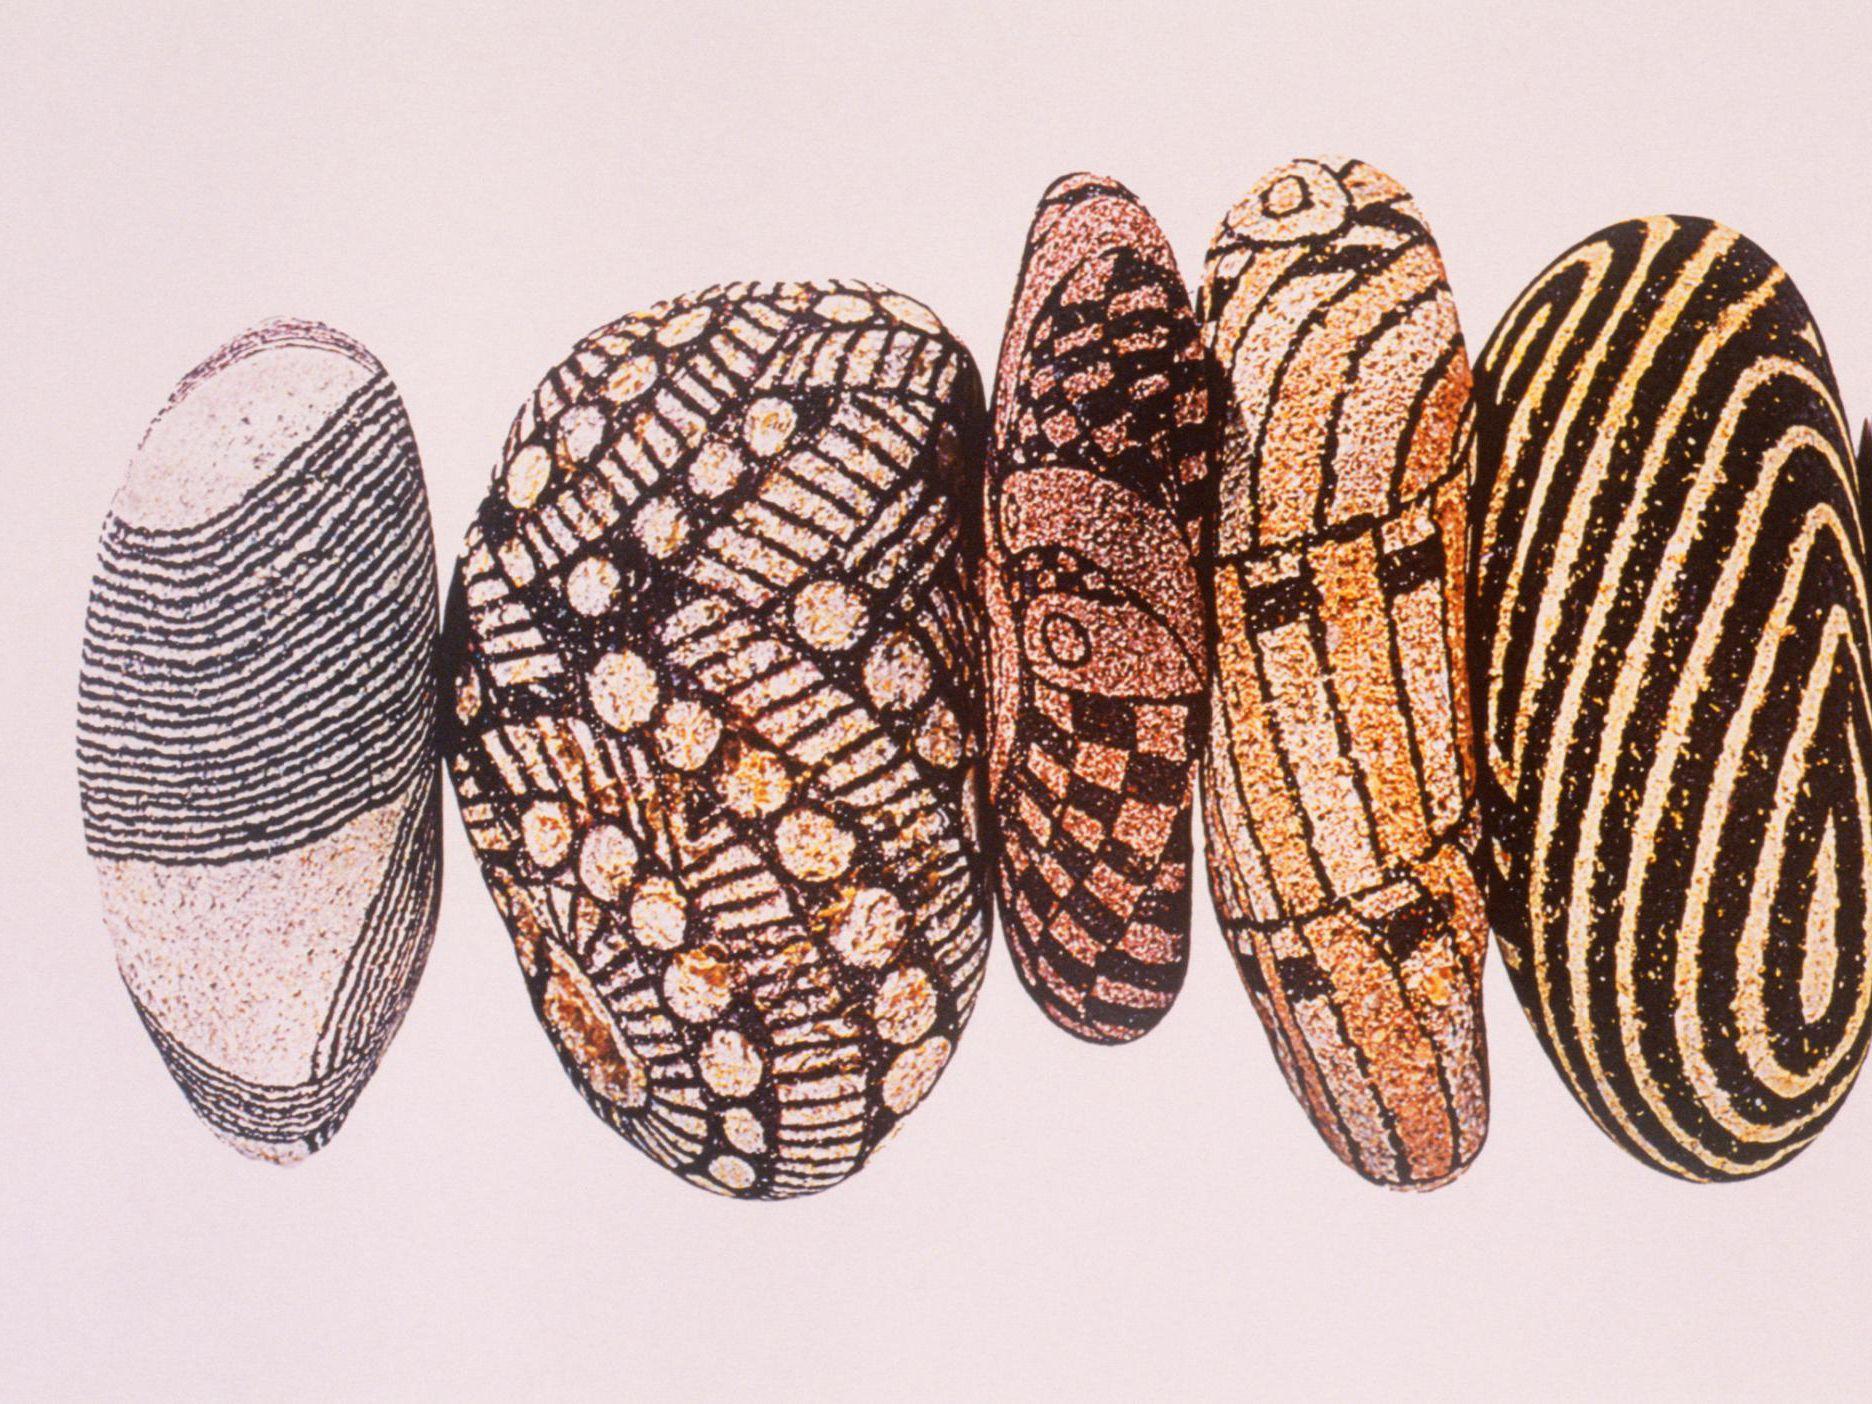 Artwork Elements Of Design Texture Definition